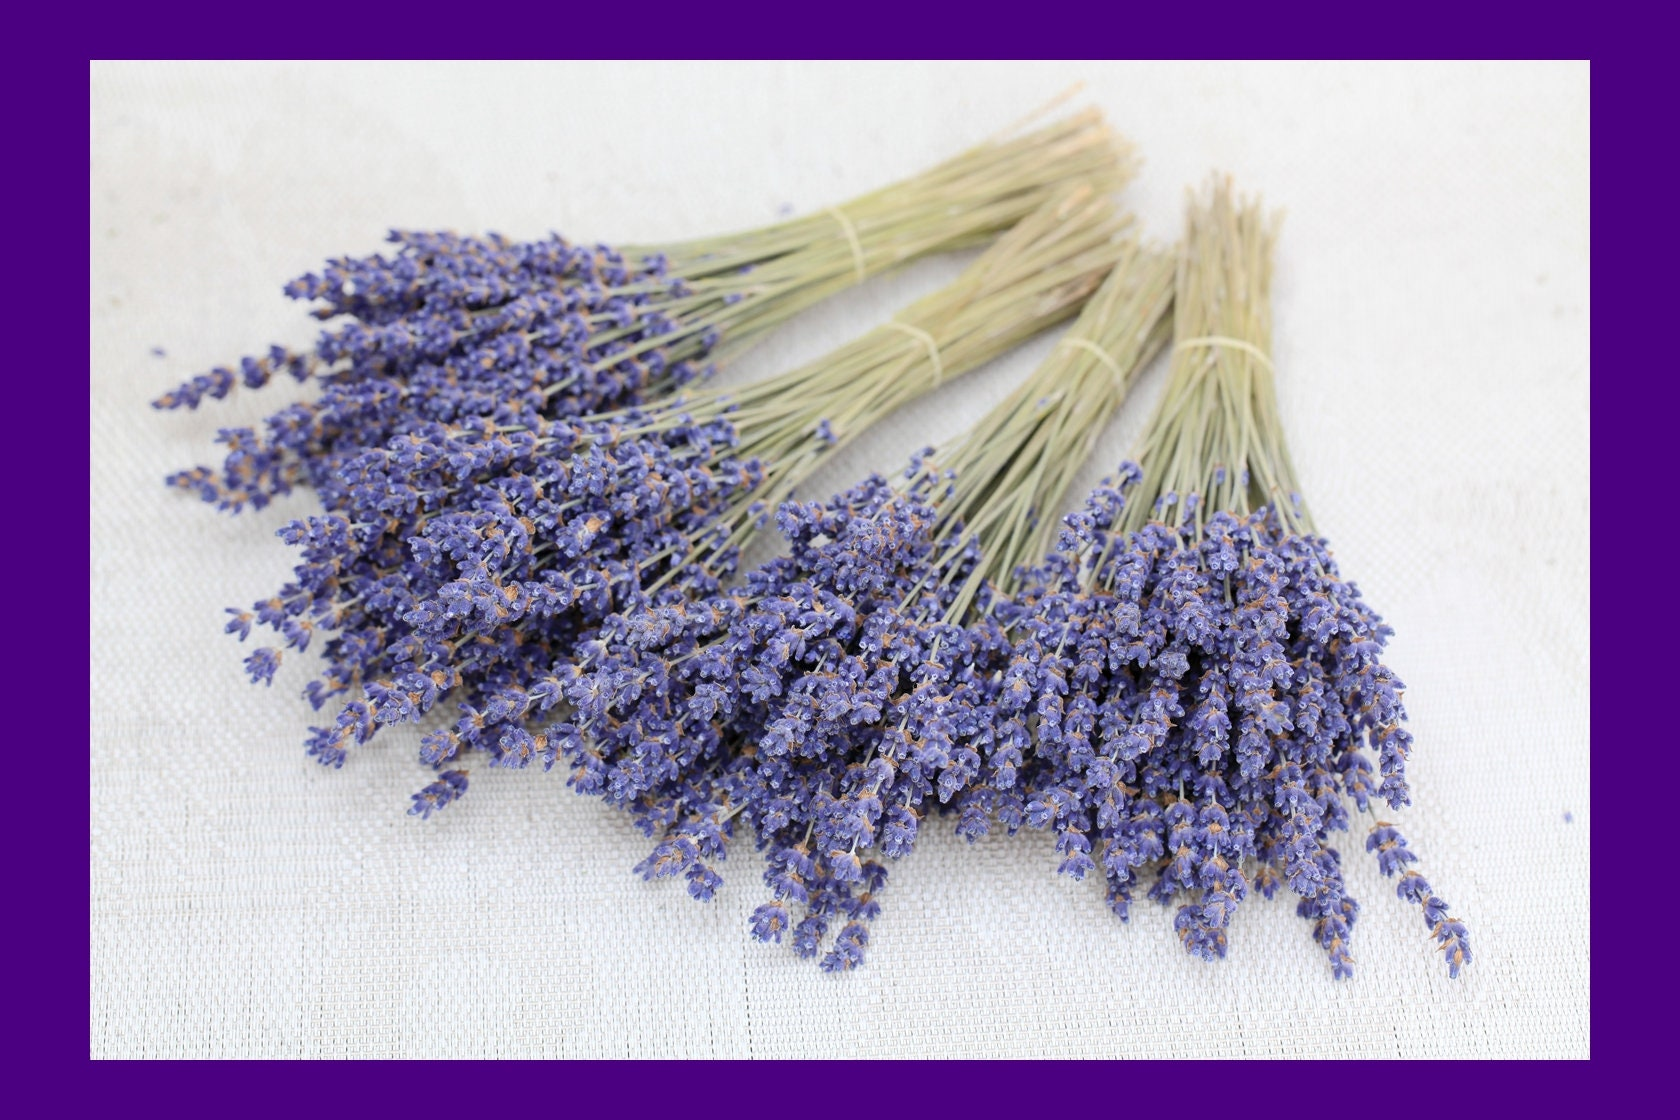 100+ Organic Lavender Cocktail Picks \\ Dried English Lavender Sprigs Garnish Picks Napkin Decoration Lavender Stems